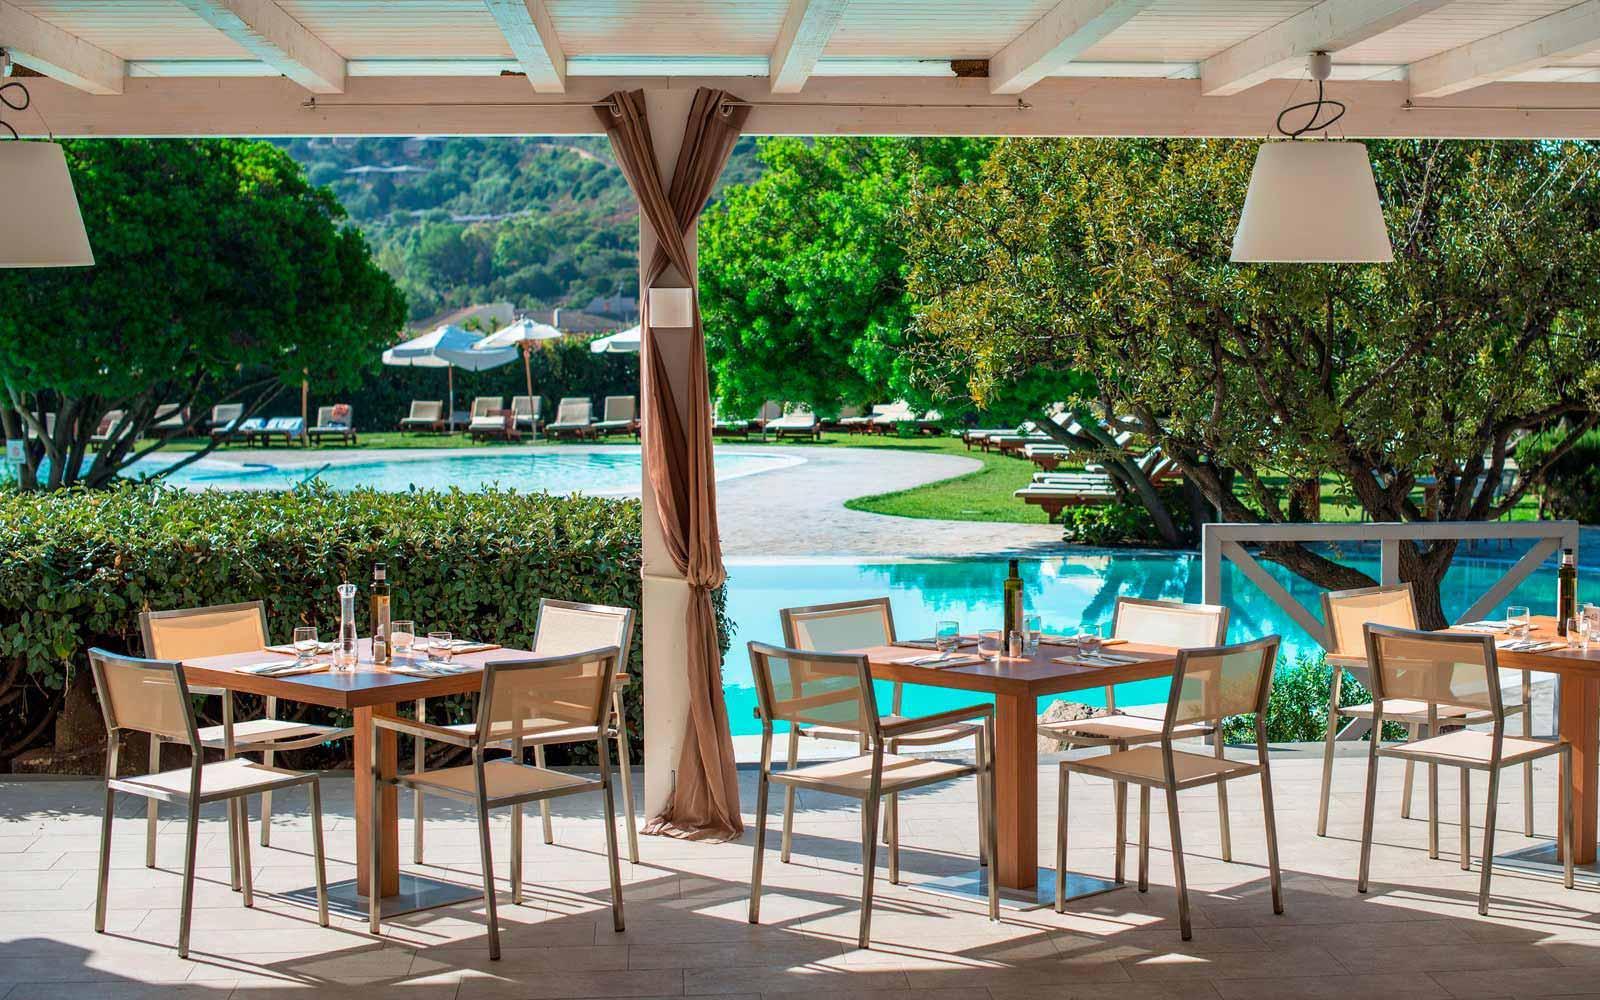 Club house pool Restaurant at the Chia Laguna Resort